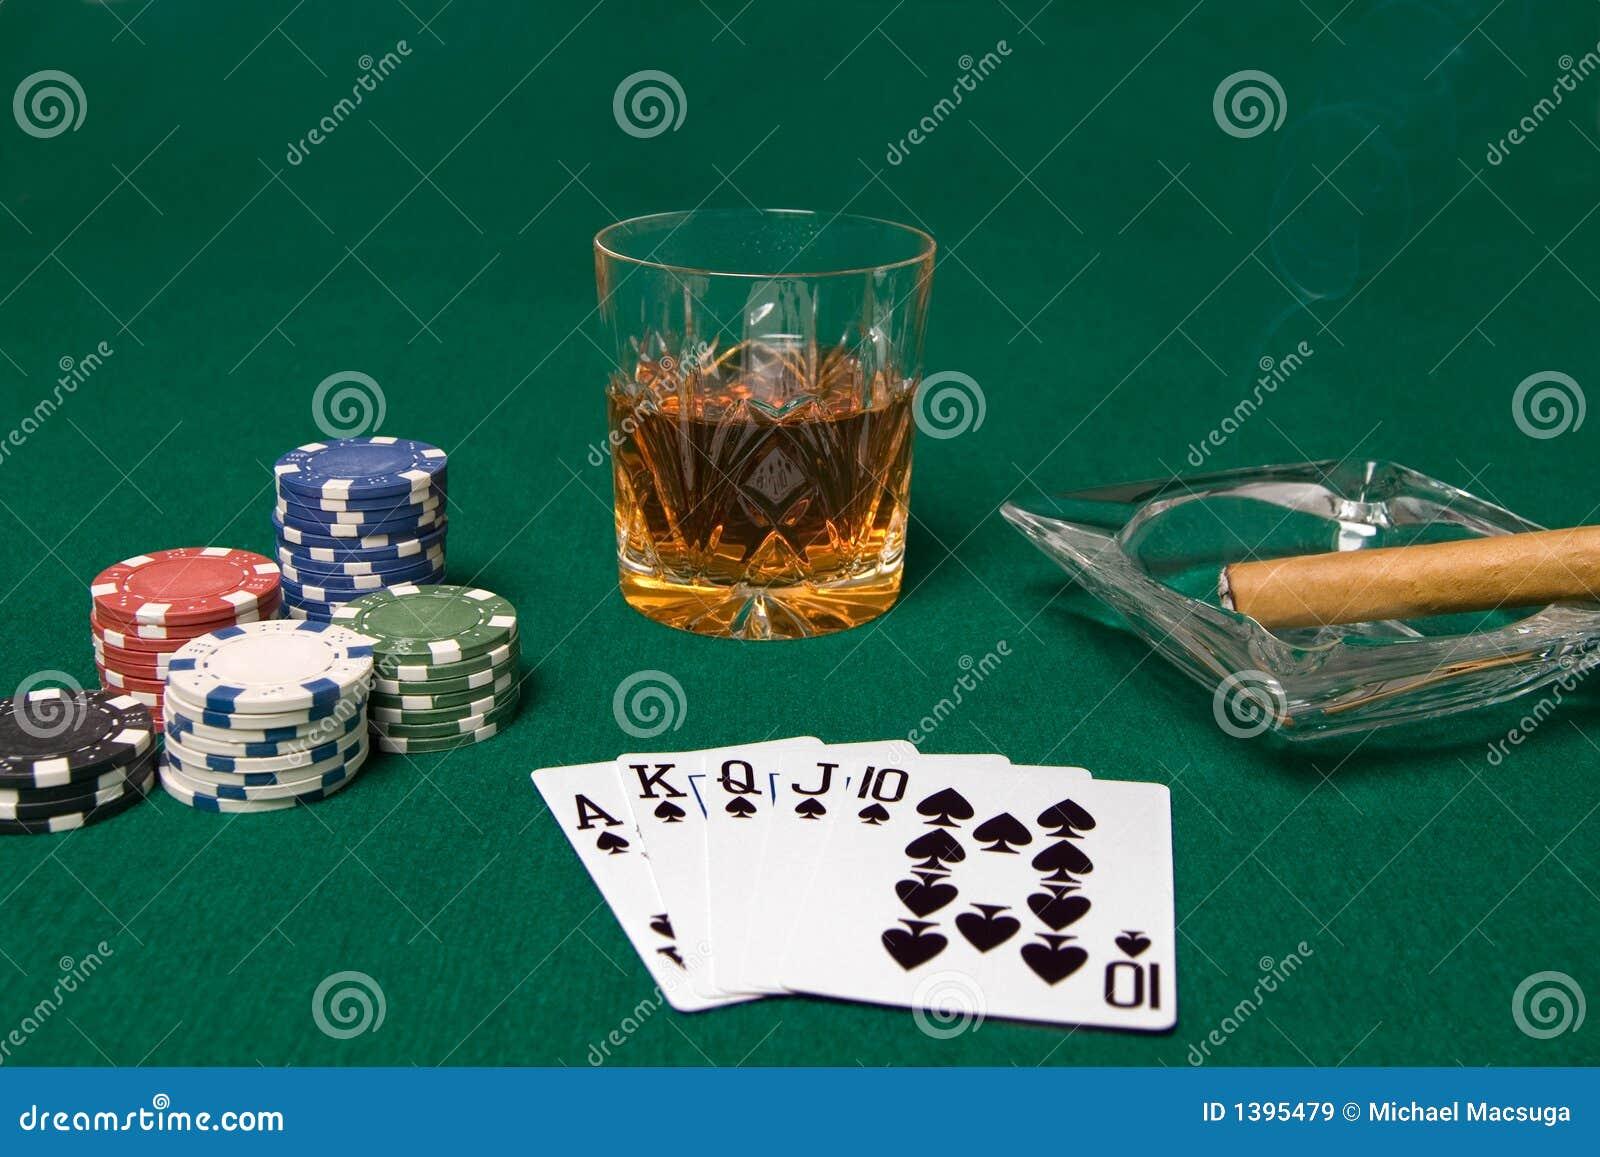 online casino euro free